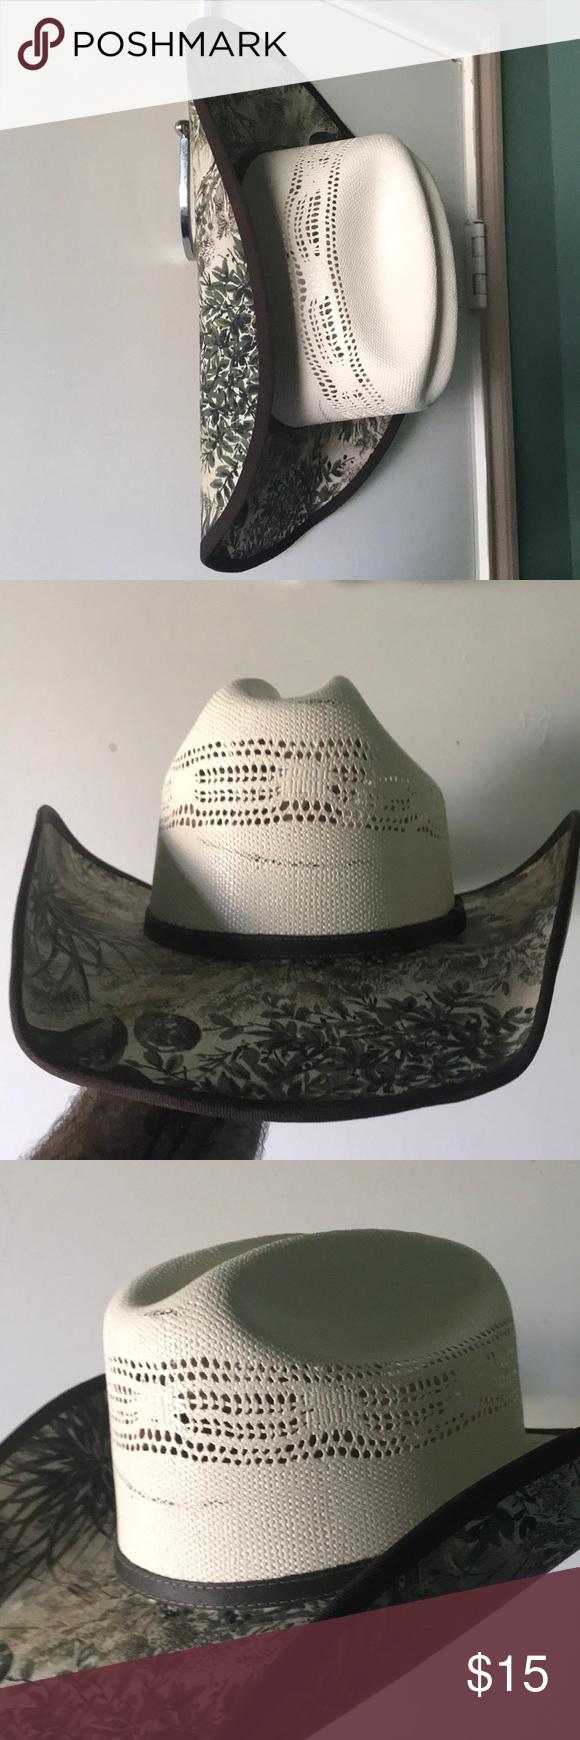 Men S Cowboy Hat Men S Stetson Cowboy Hat Size Medium 7 1 8 7 1 4 Never Been Worn No Tags Or Box Breatha Cowboy Hats Mens Cowboy Hats Stetson Cowboy Hats